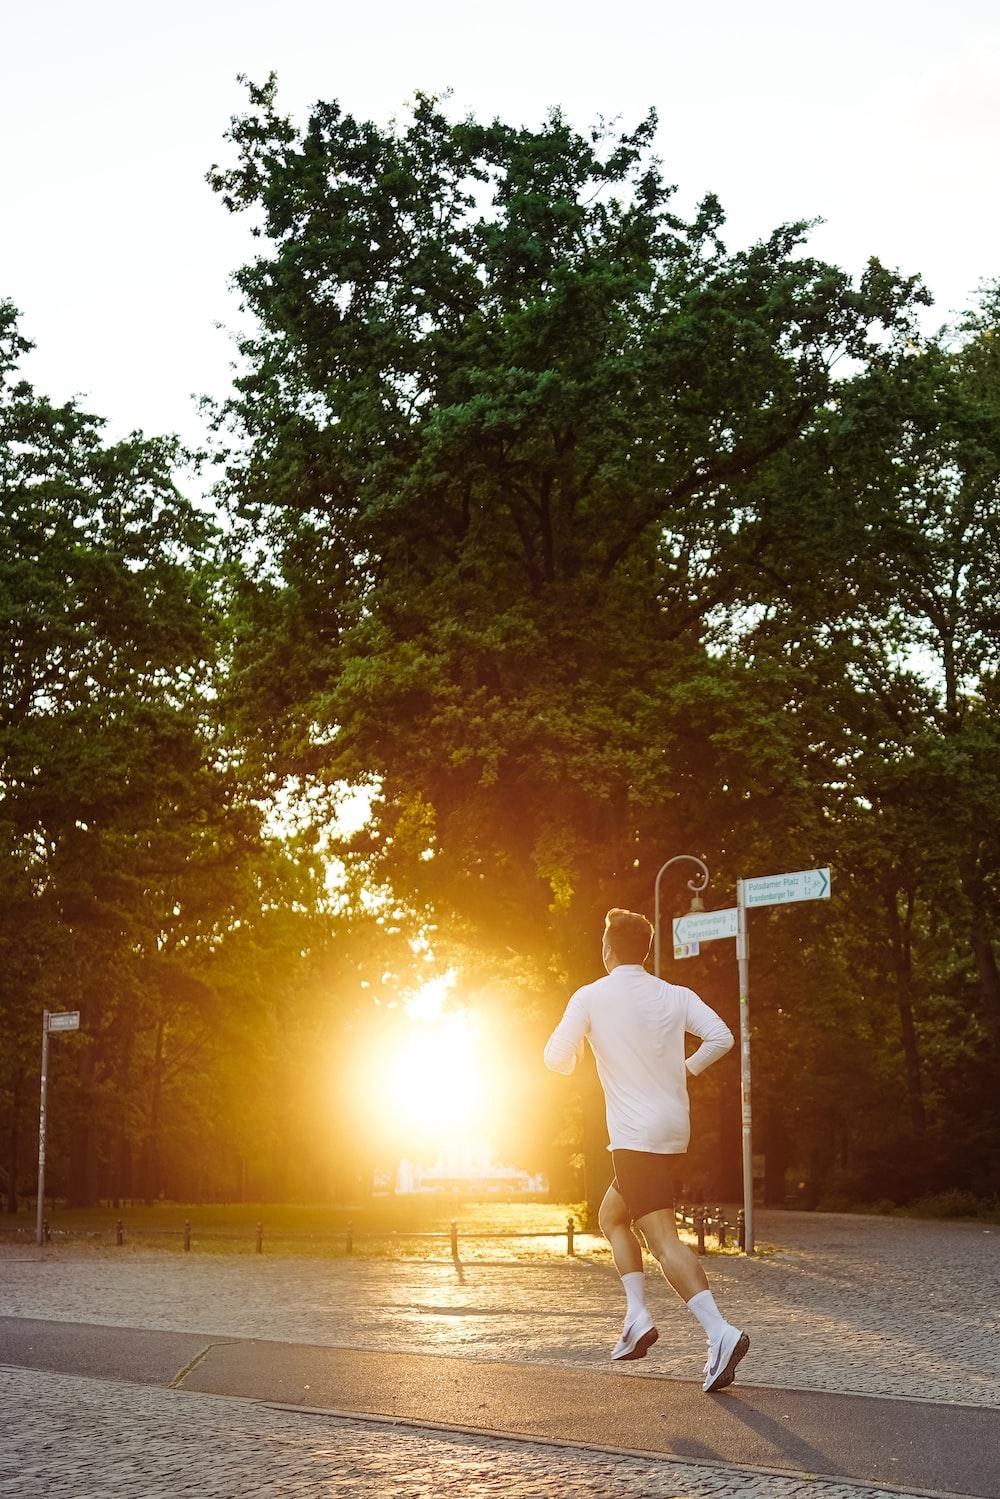 man in running on pathway near trees